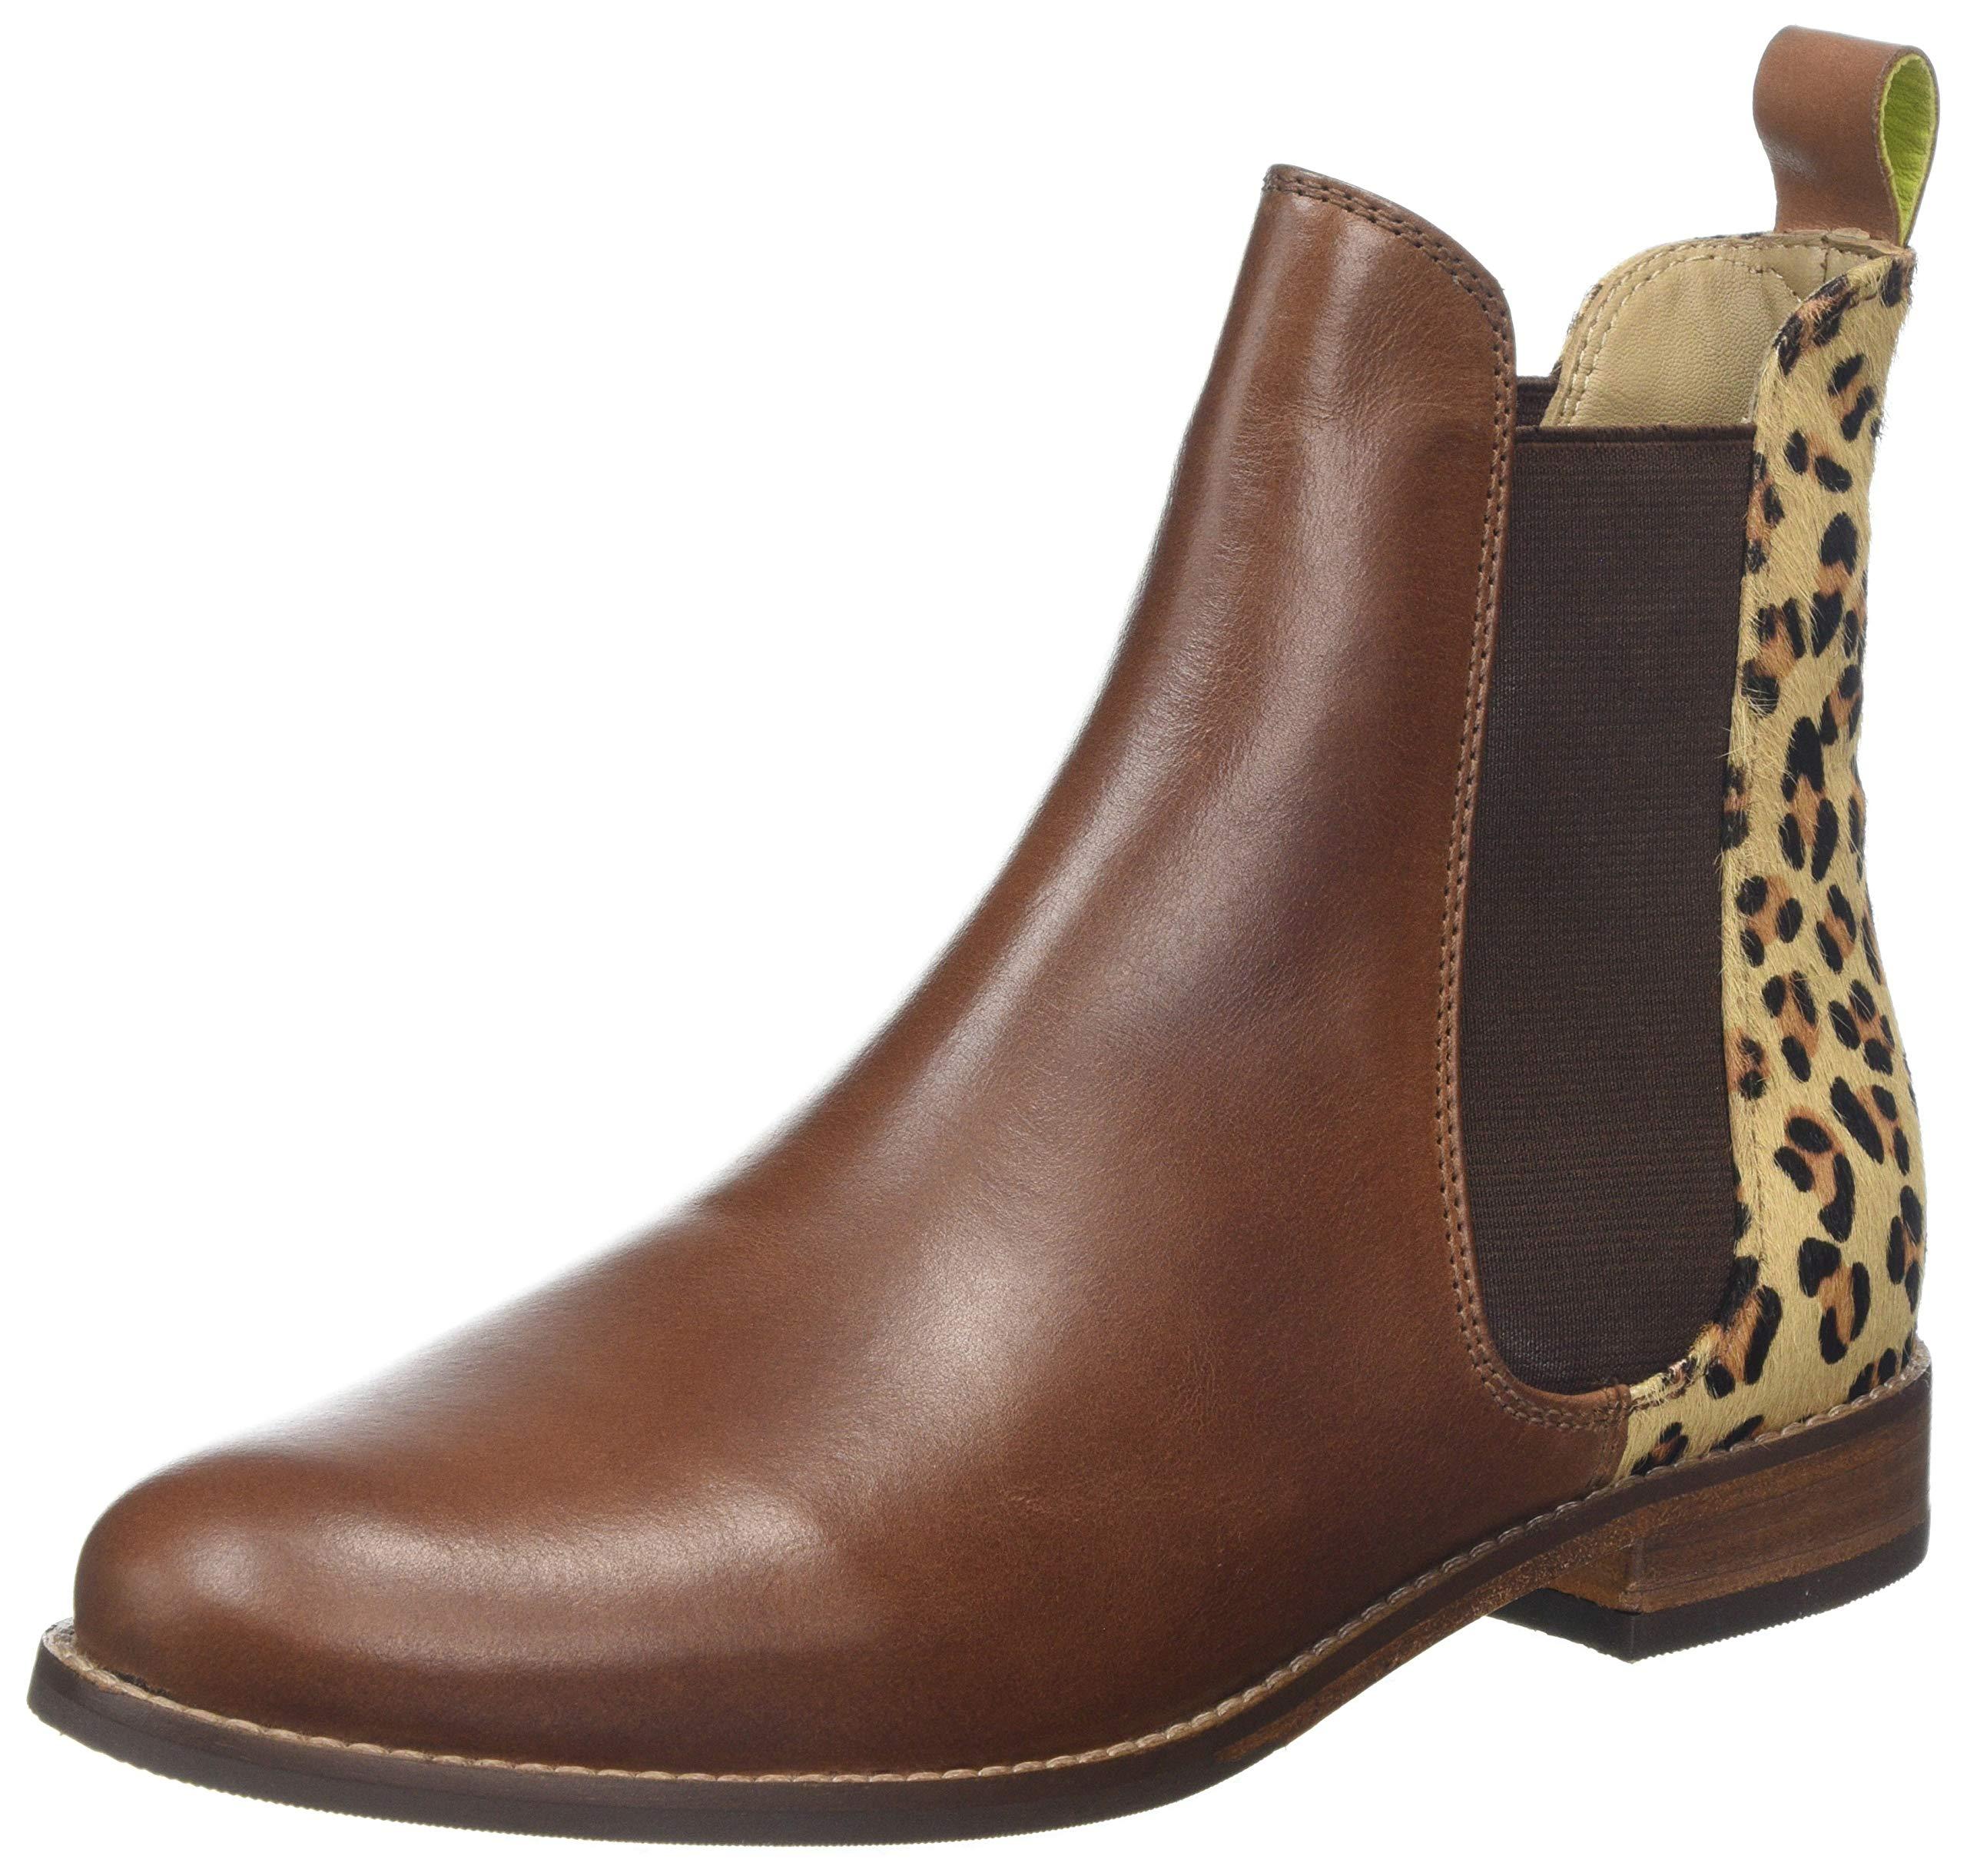 Eu FemmeMarron Leopard36 WestbourneBottes Chelsea Joules nk0wXP8O